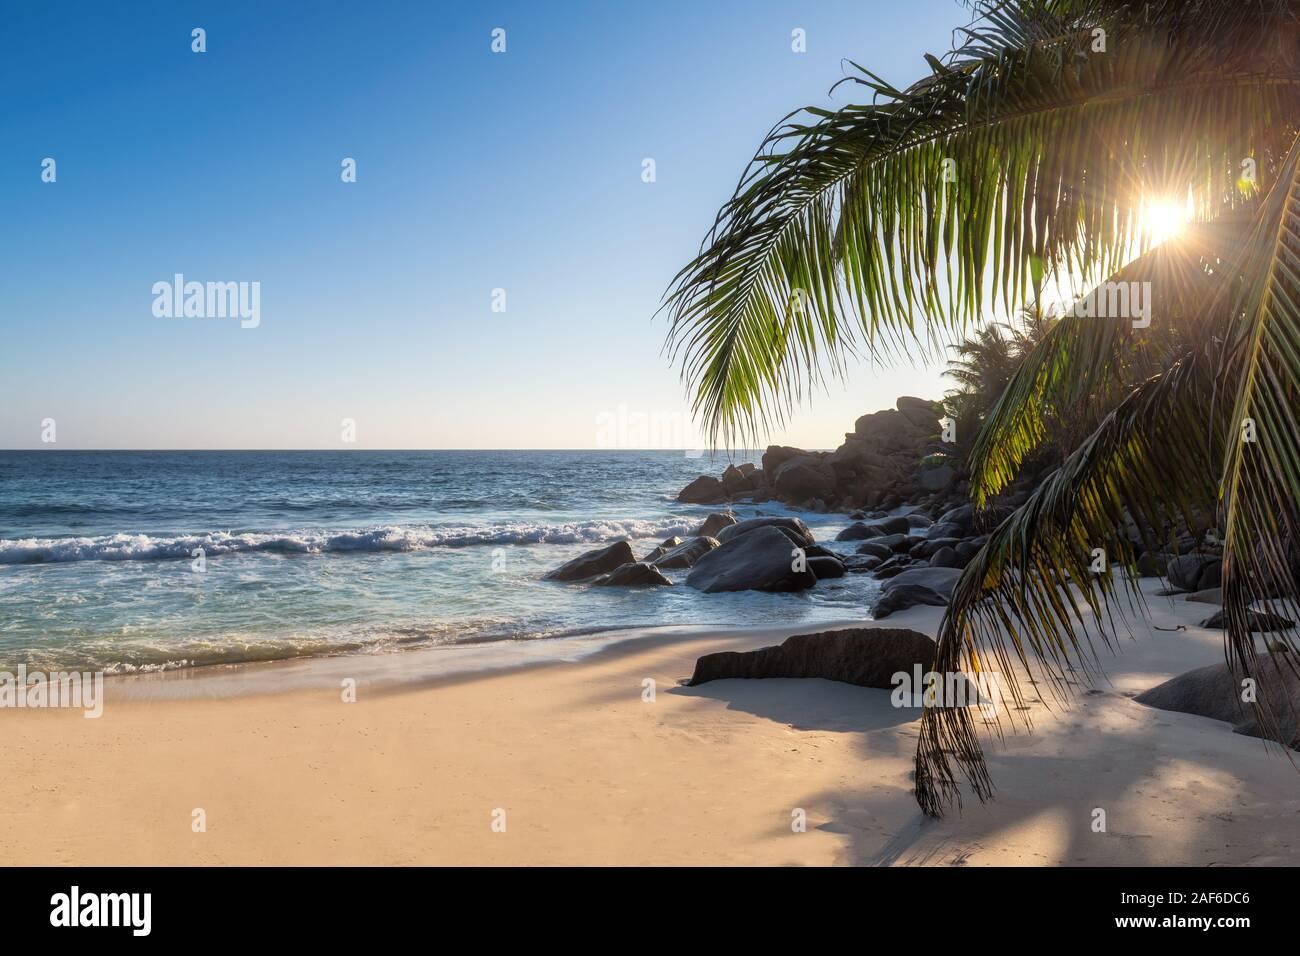 Atardecer en la playa tropical exótica Foto de stock